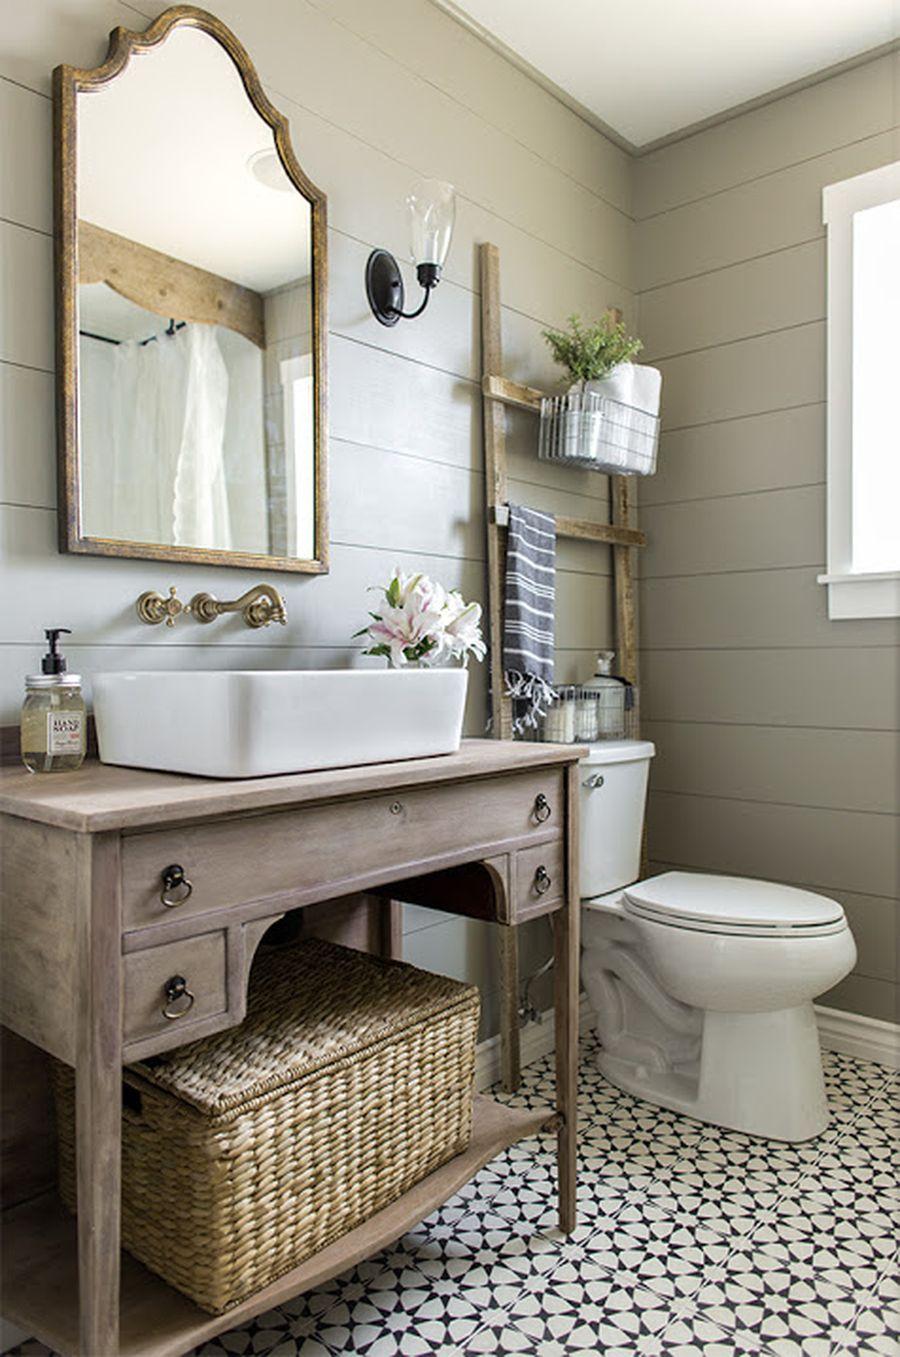 60 rustic farmhouse style bathroom design ideas bathroom ideas rh pinterest com